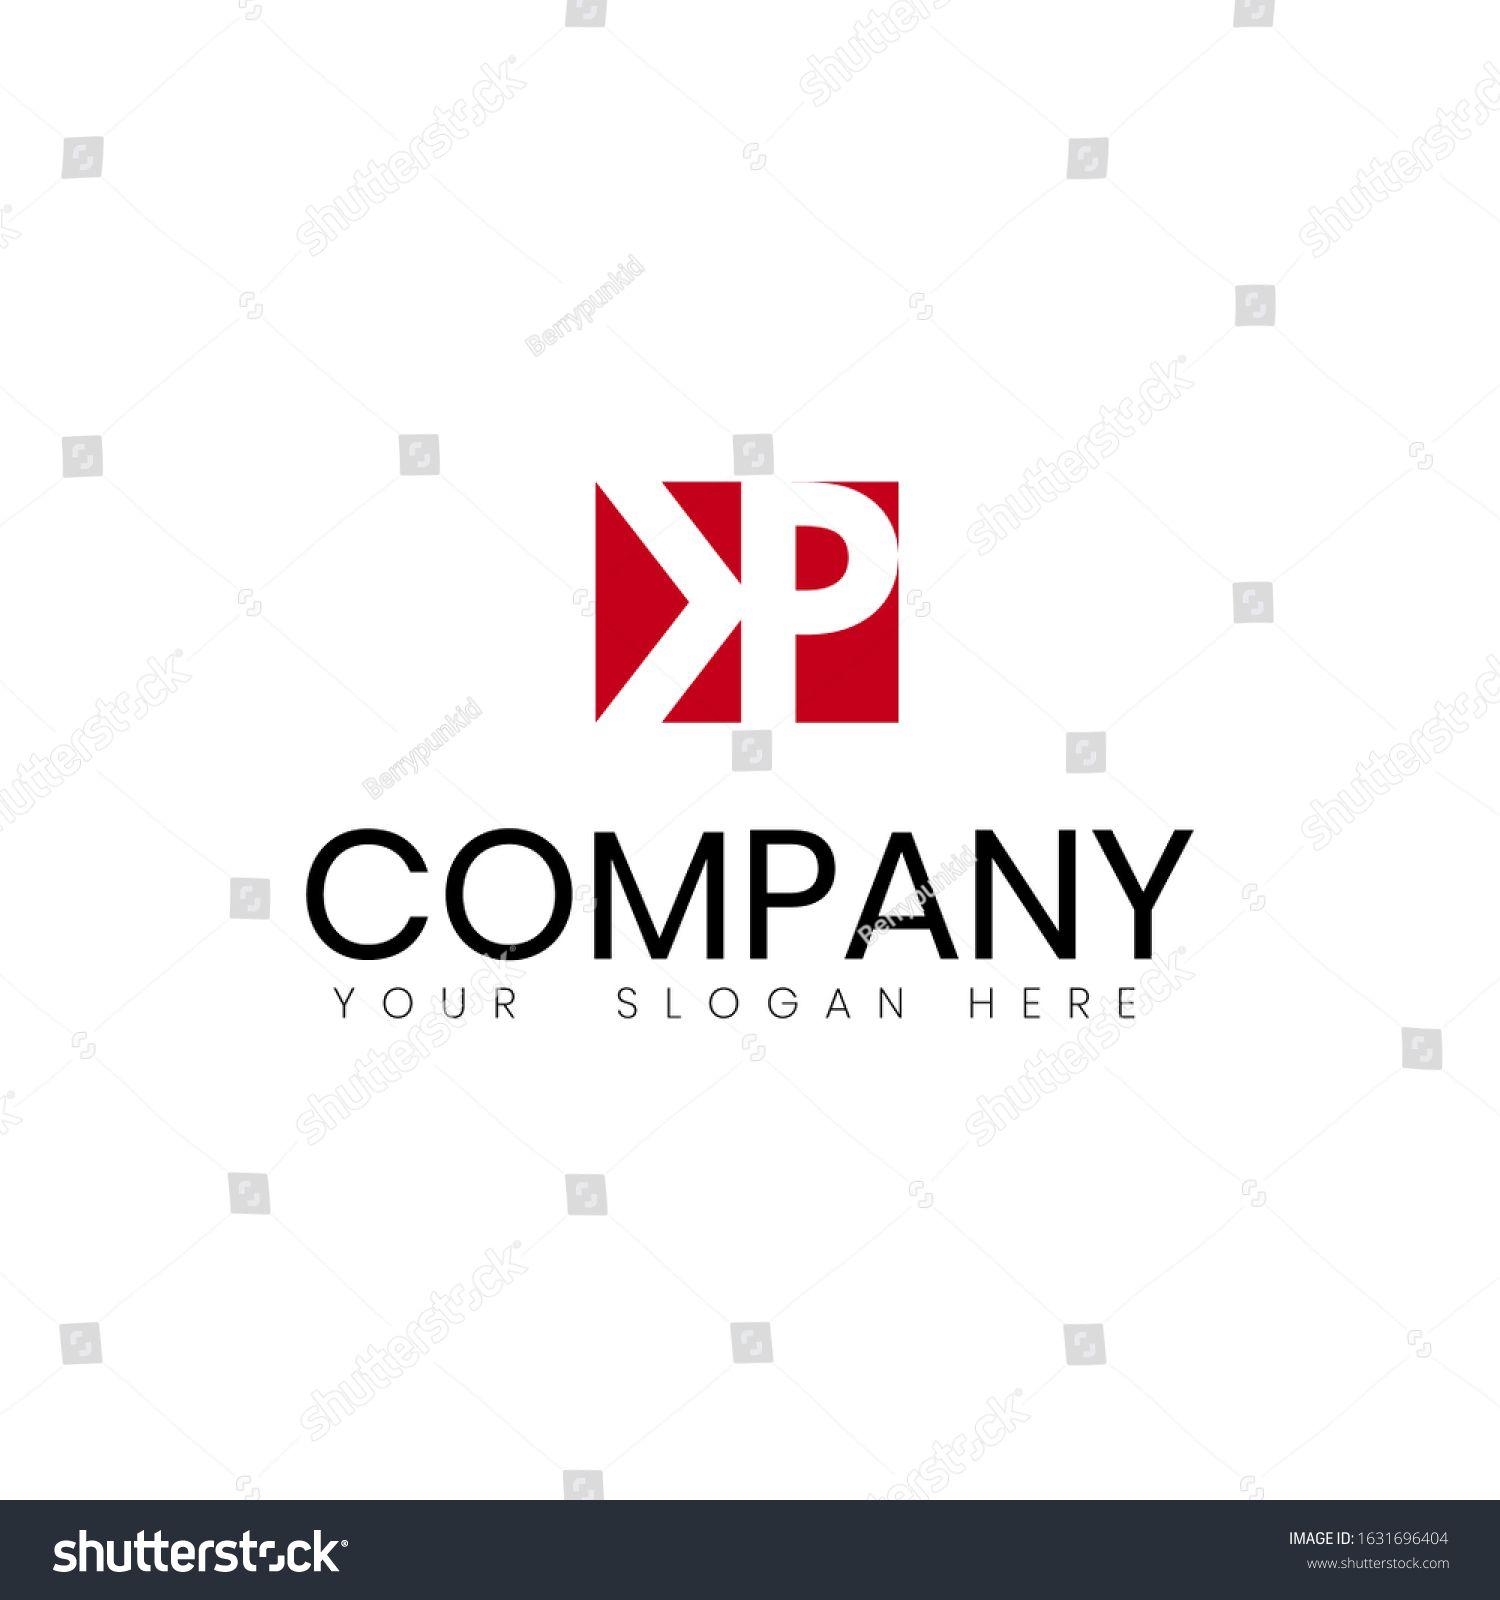 Logo Kp Conceptdesign Vector Symbol Initial Stock Vector (Royalty Free) 1631696404